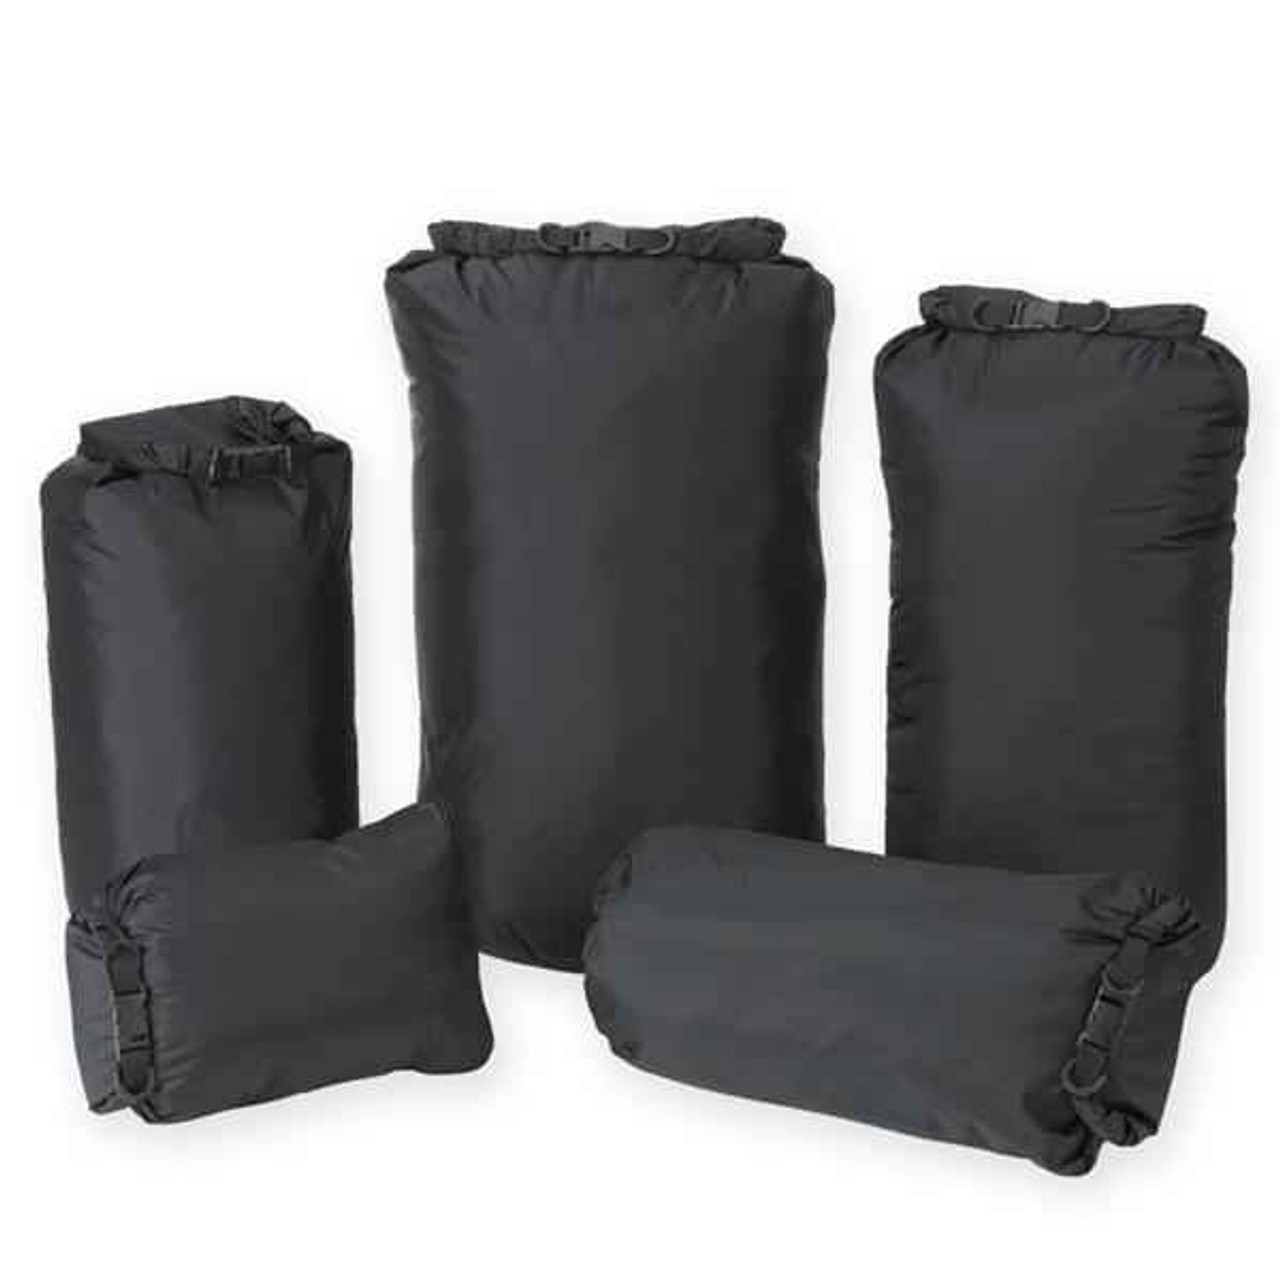 Pro Force Dri-Sak Waterproof Bag - XX Large, Black